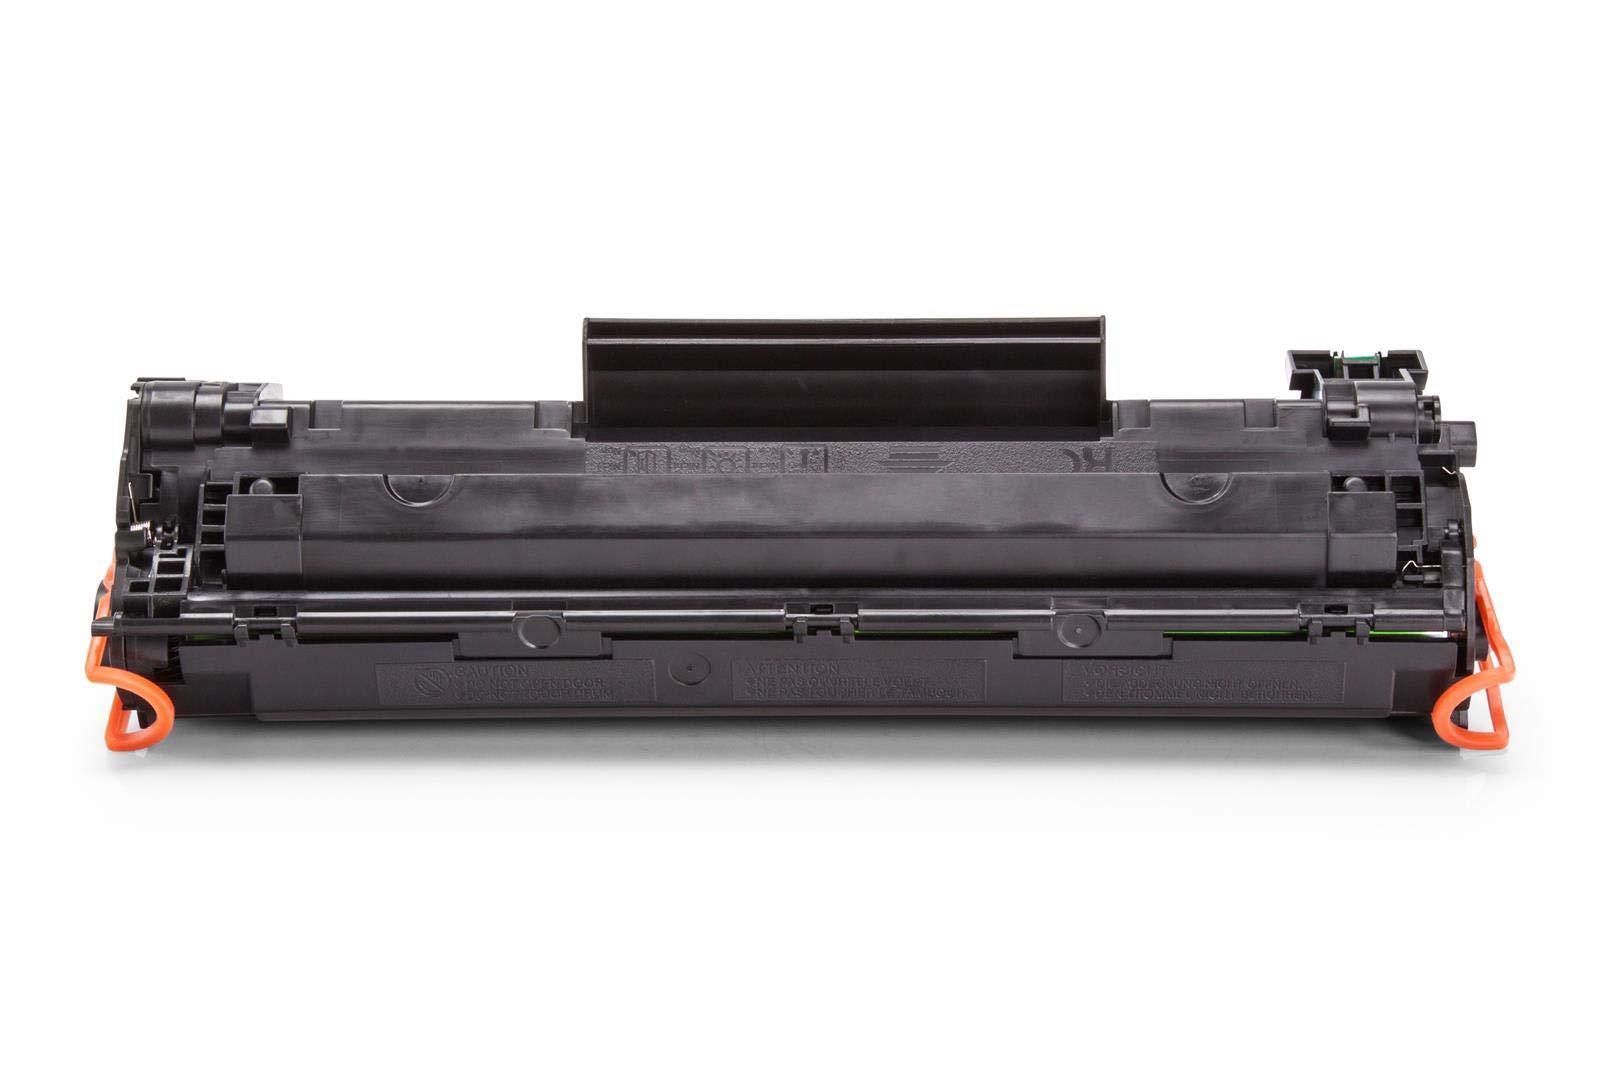 InkChimp-Toner-kompatibel-zu-HP-CF279A-CF-279-A-passend-fr-HP-Laserjet-Pro-M12a-HP-Laserjet-Pro-M12w-HP-Laserjet-Pro-M26a-HP-Laserjet-Pro-M26nw